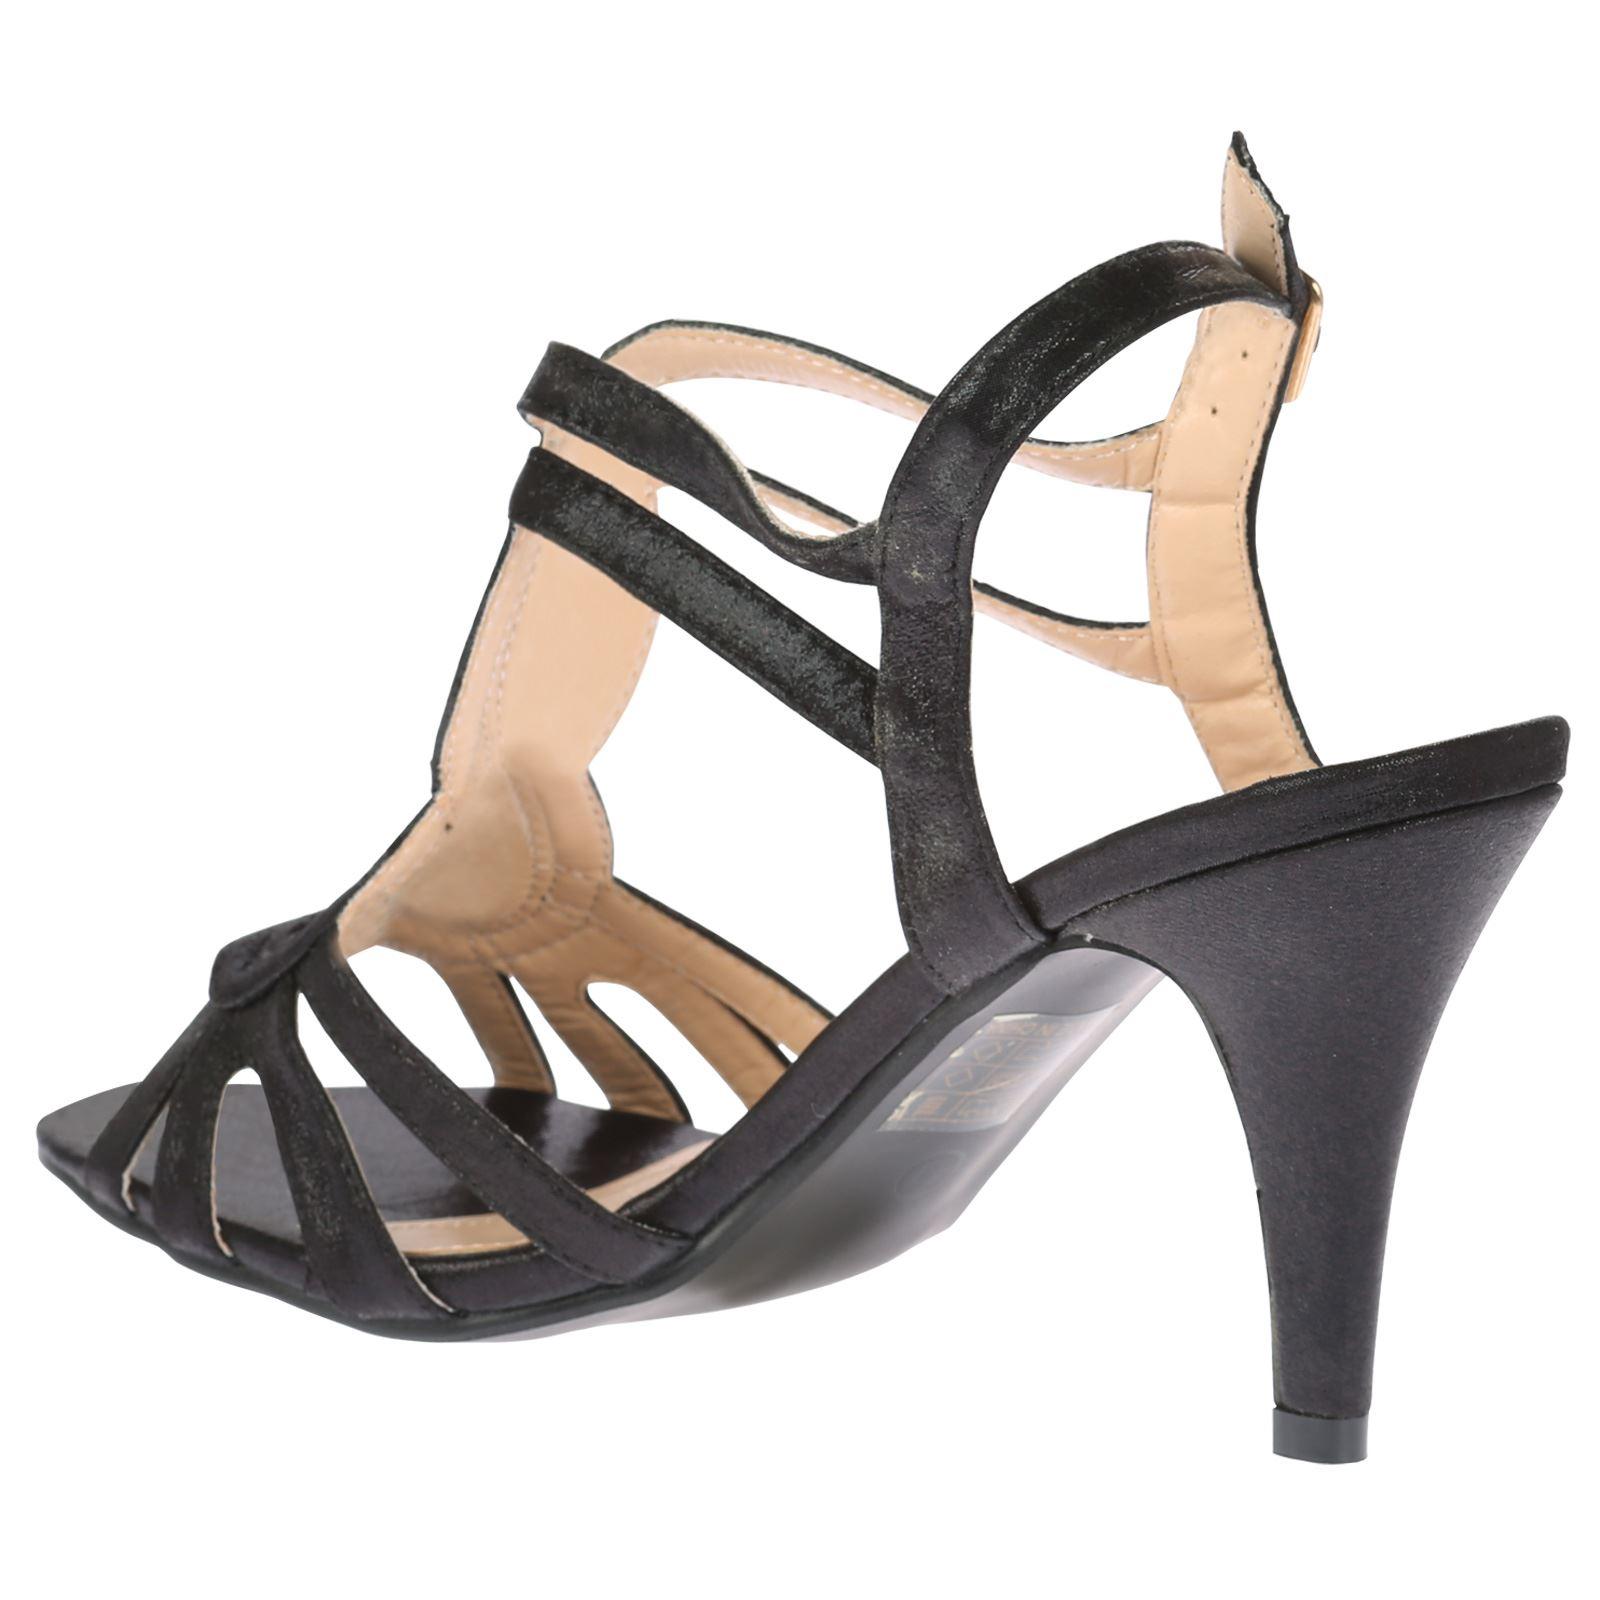 may womens mid high heels slim shimmer peep toe sandals